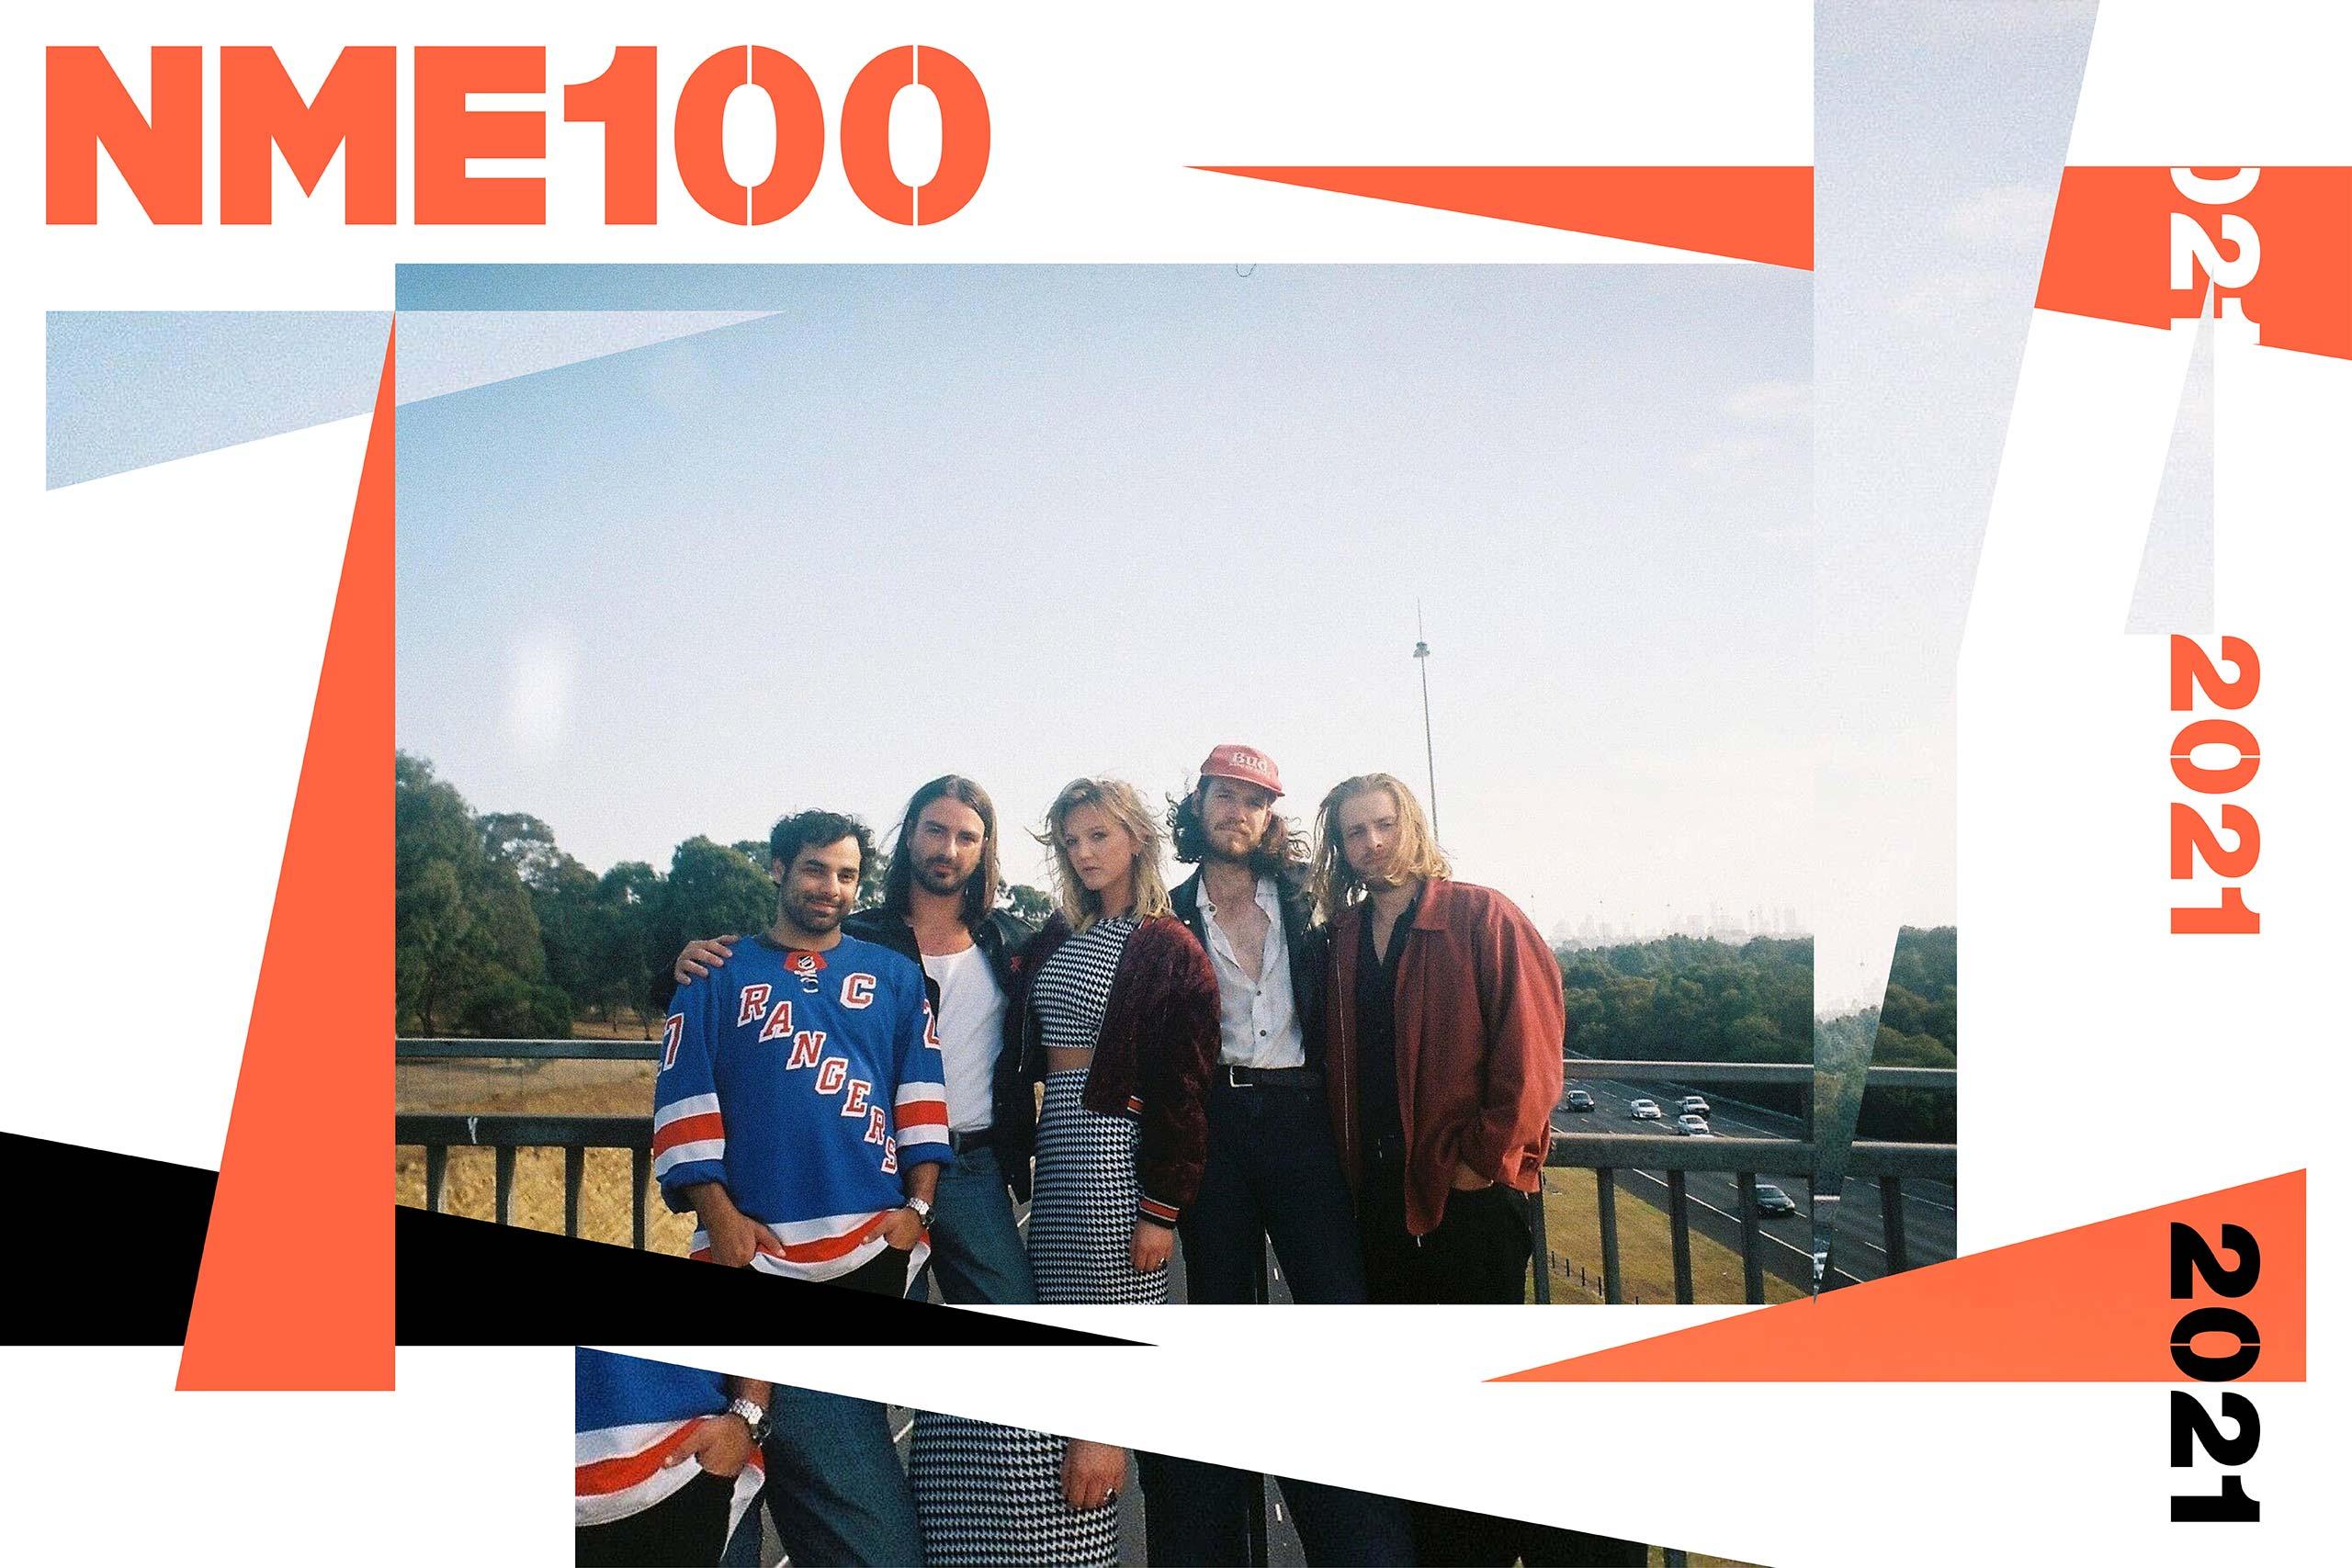 NME 100 romero